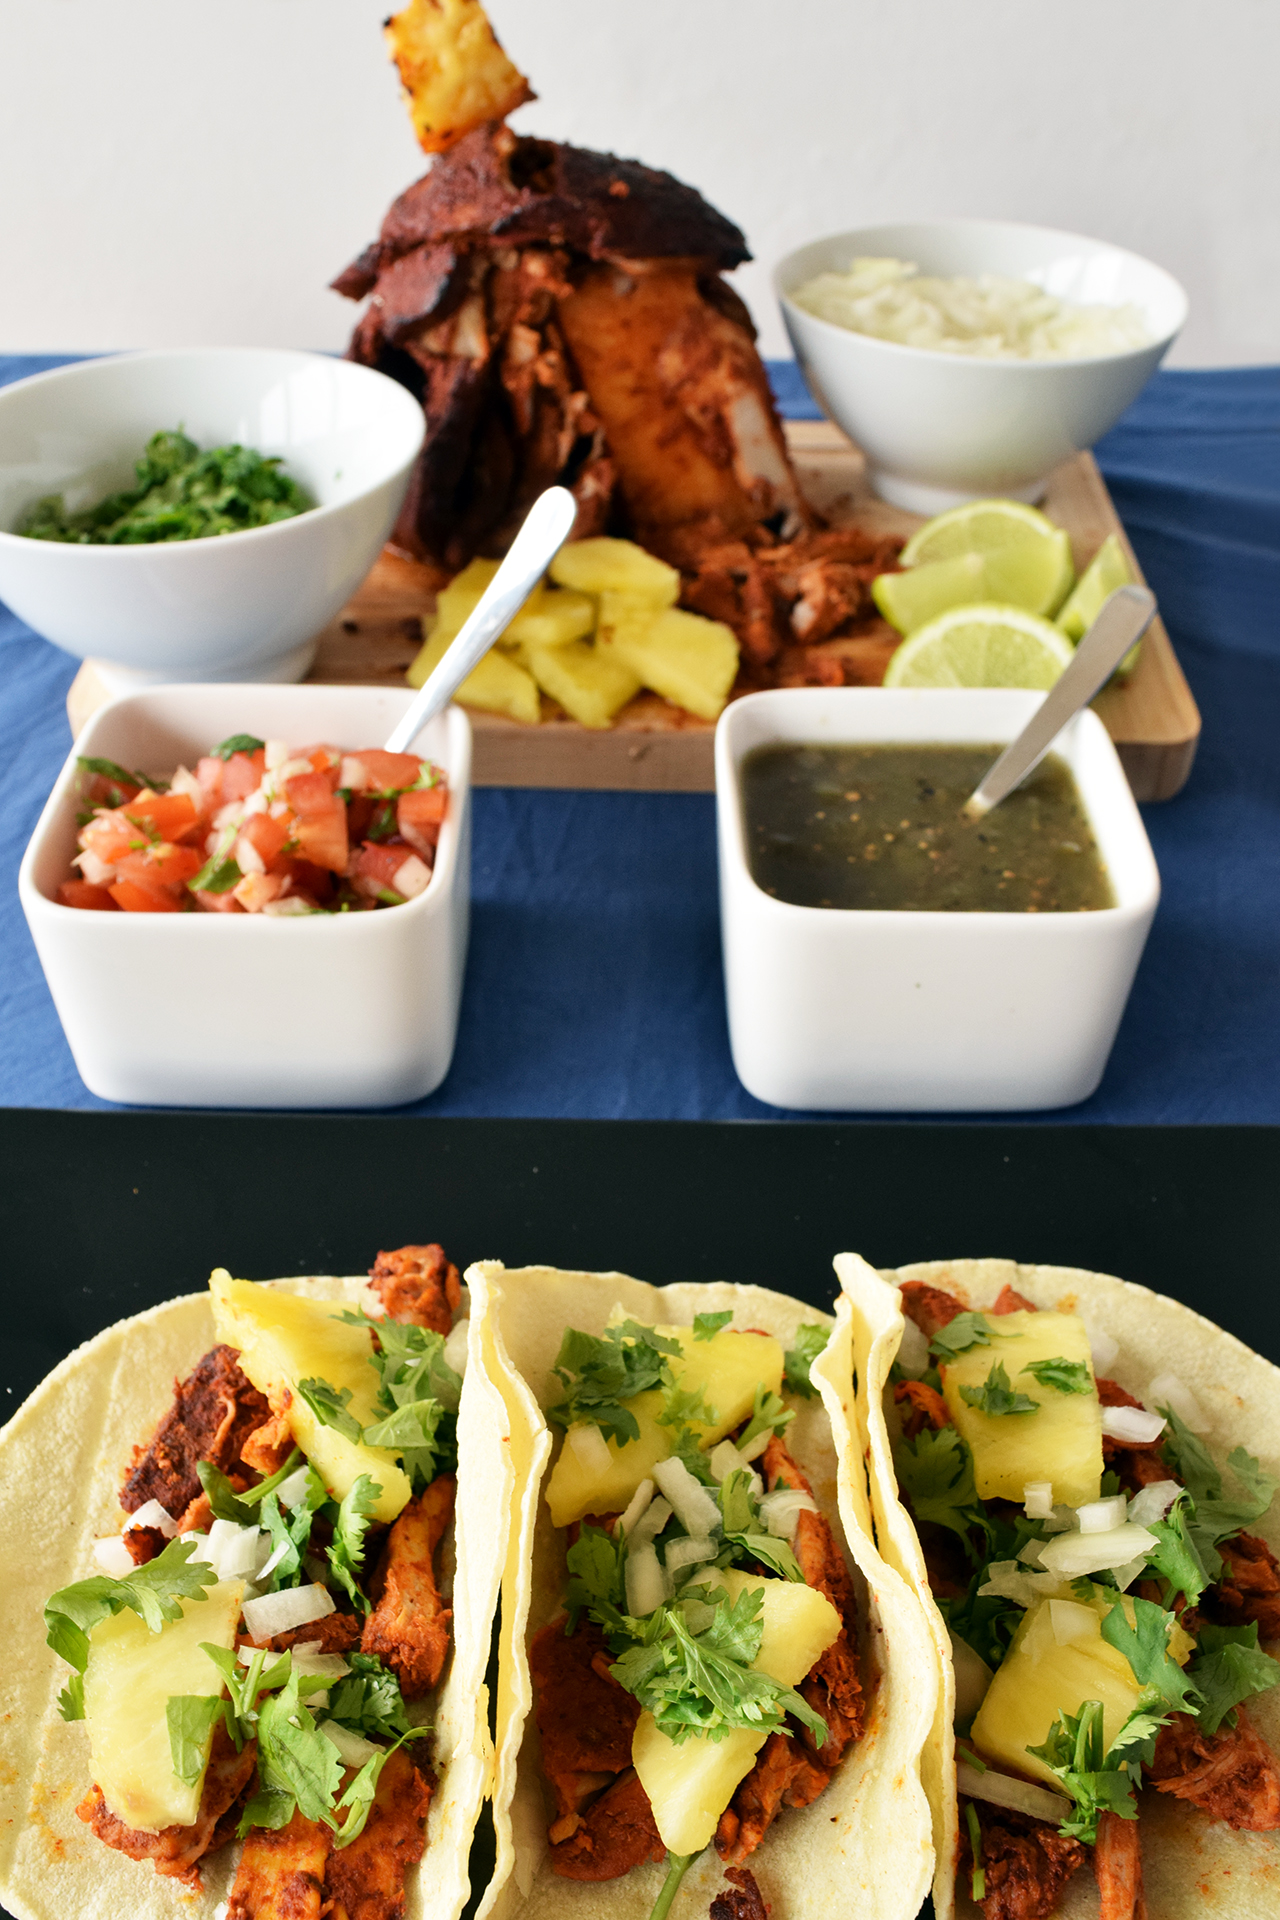 Receta de tacos al pastor receta mexicana recetas abc for Comidas para preparar